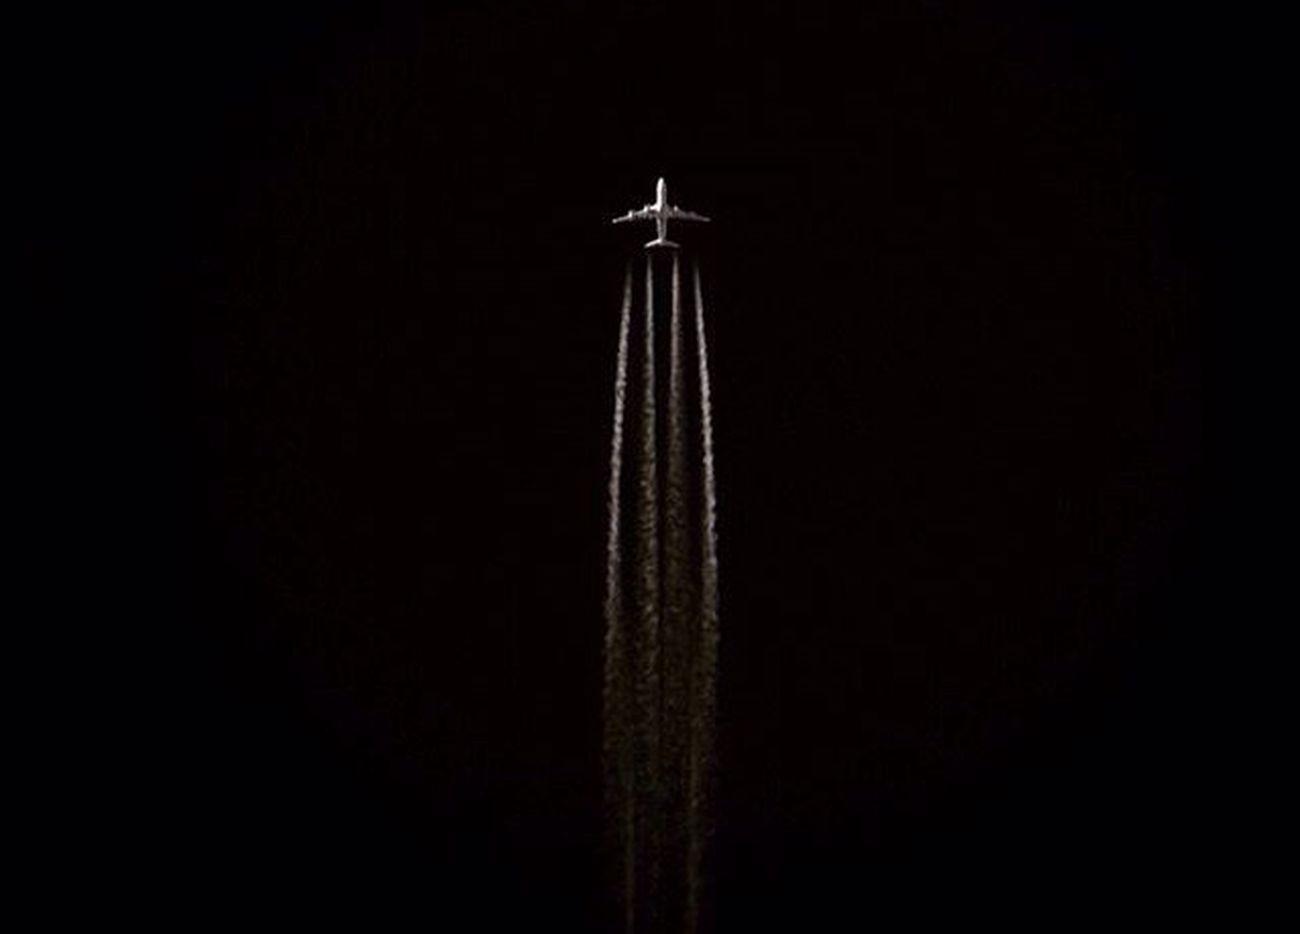 Pássaro de Metal ✈️ Skydark AirPlane ✈ Infinity First Eyeem Photo